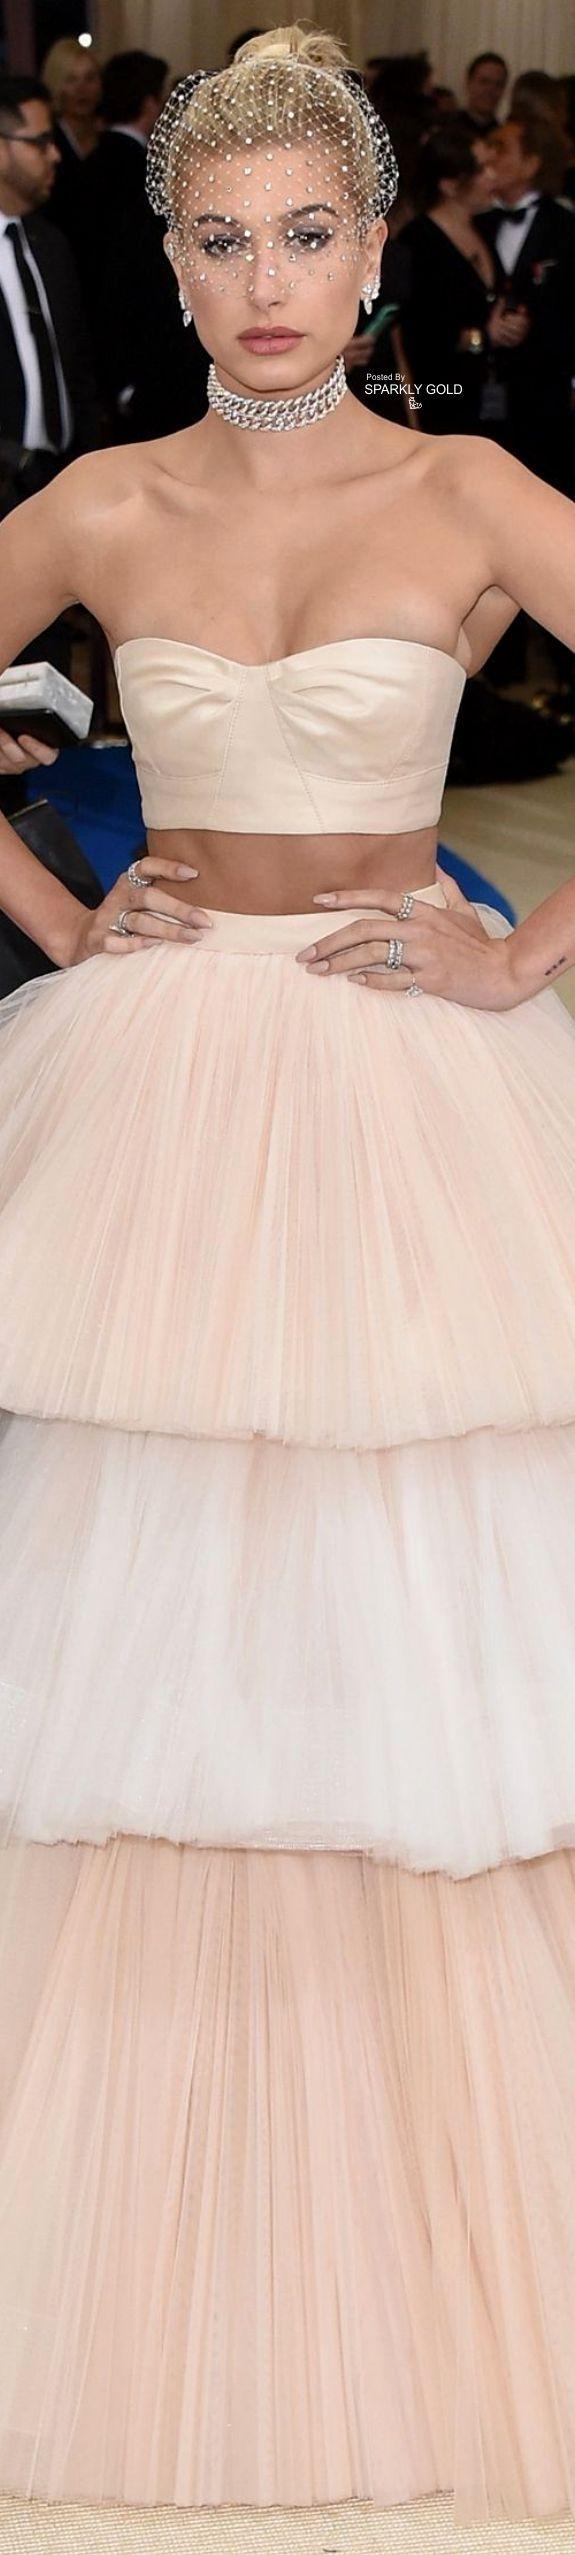 Hailey Baldwin (daughter of Stephen) at the Met Gala 2017 (photo Carolina Herrera)